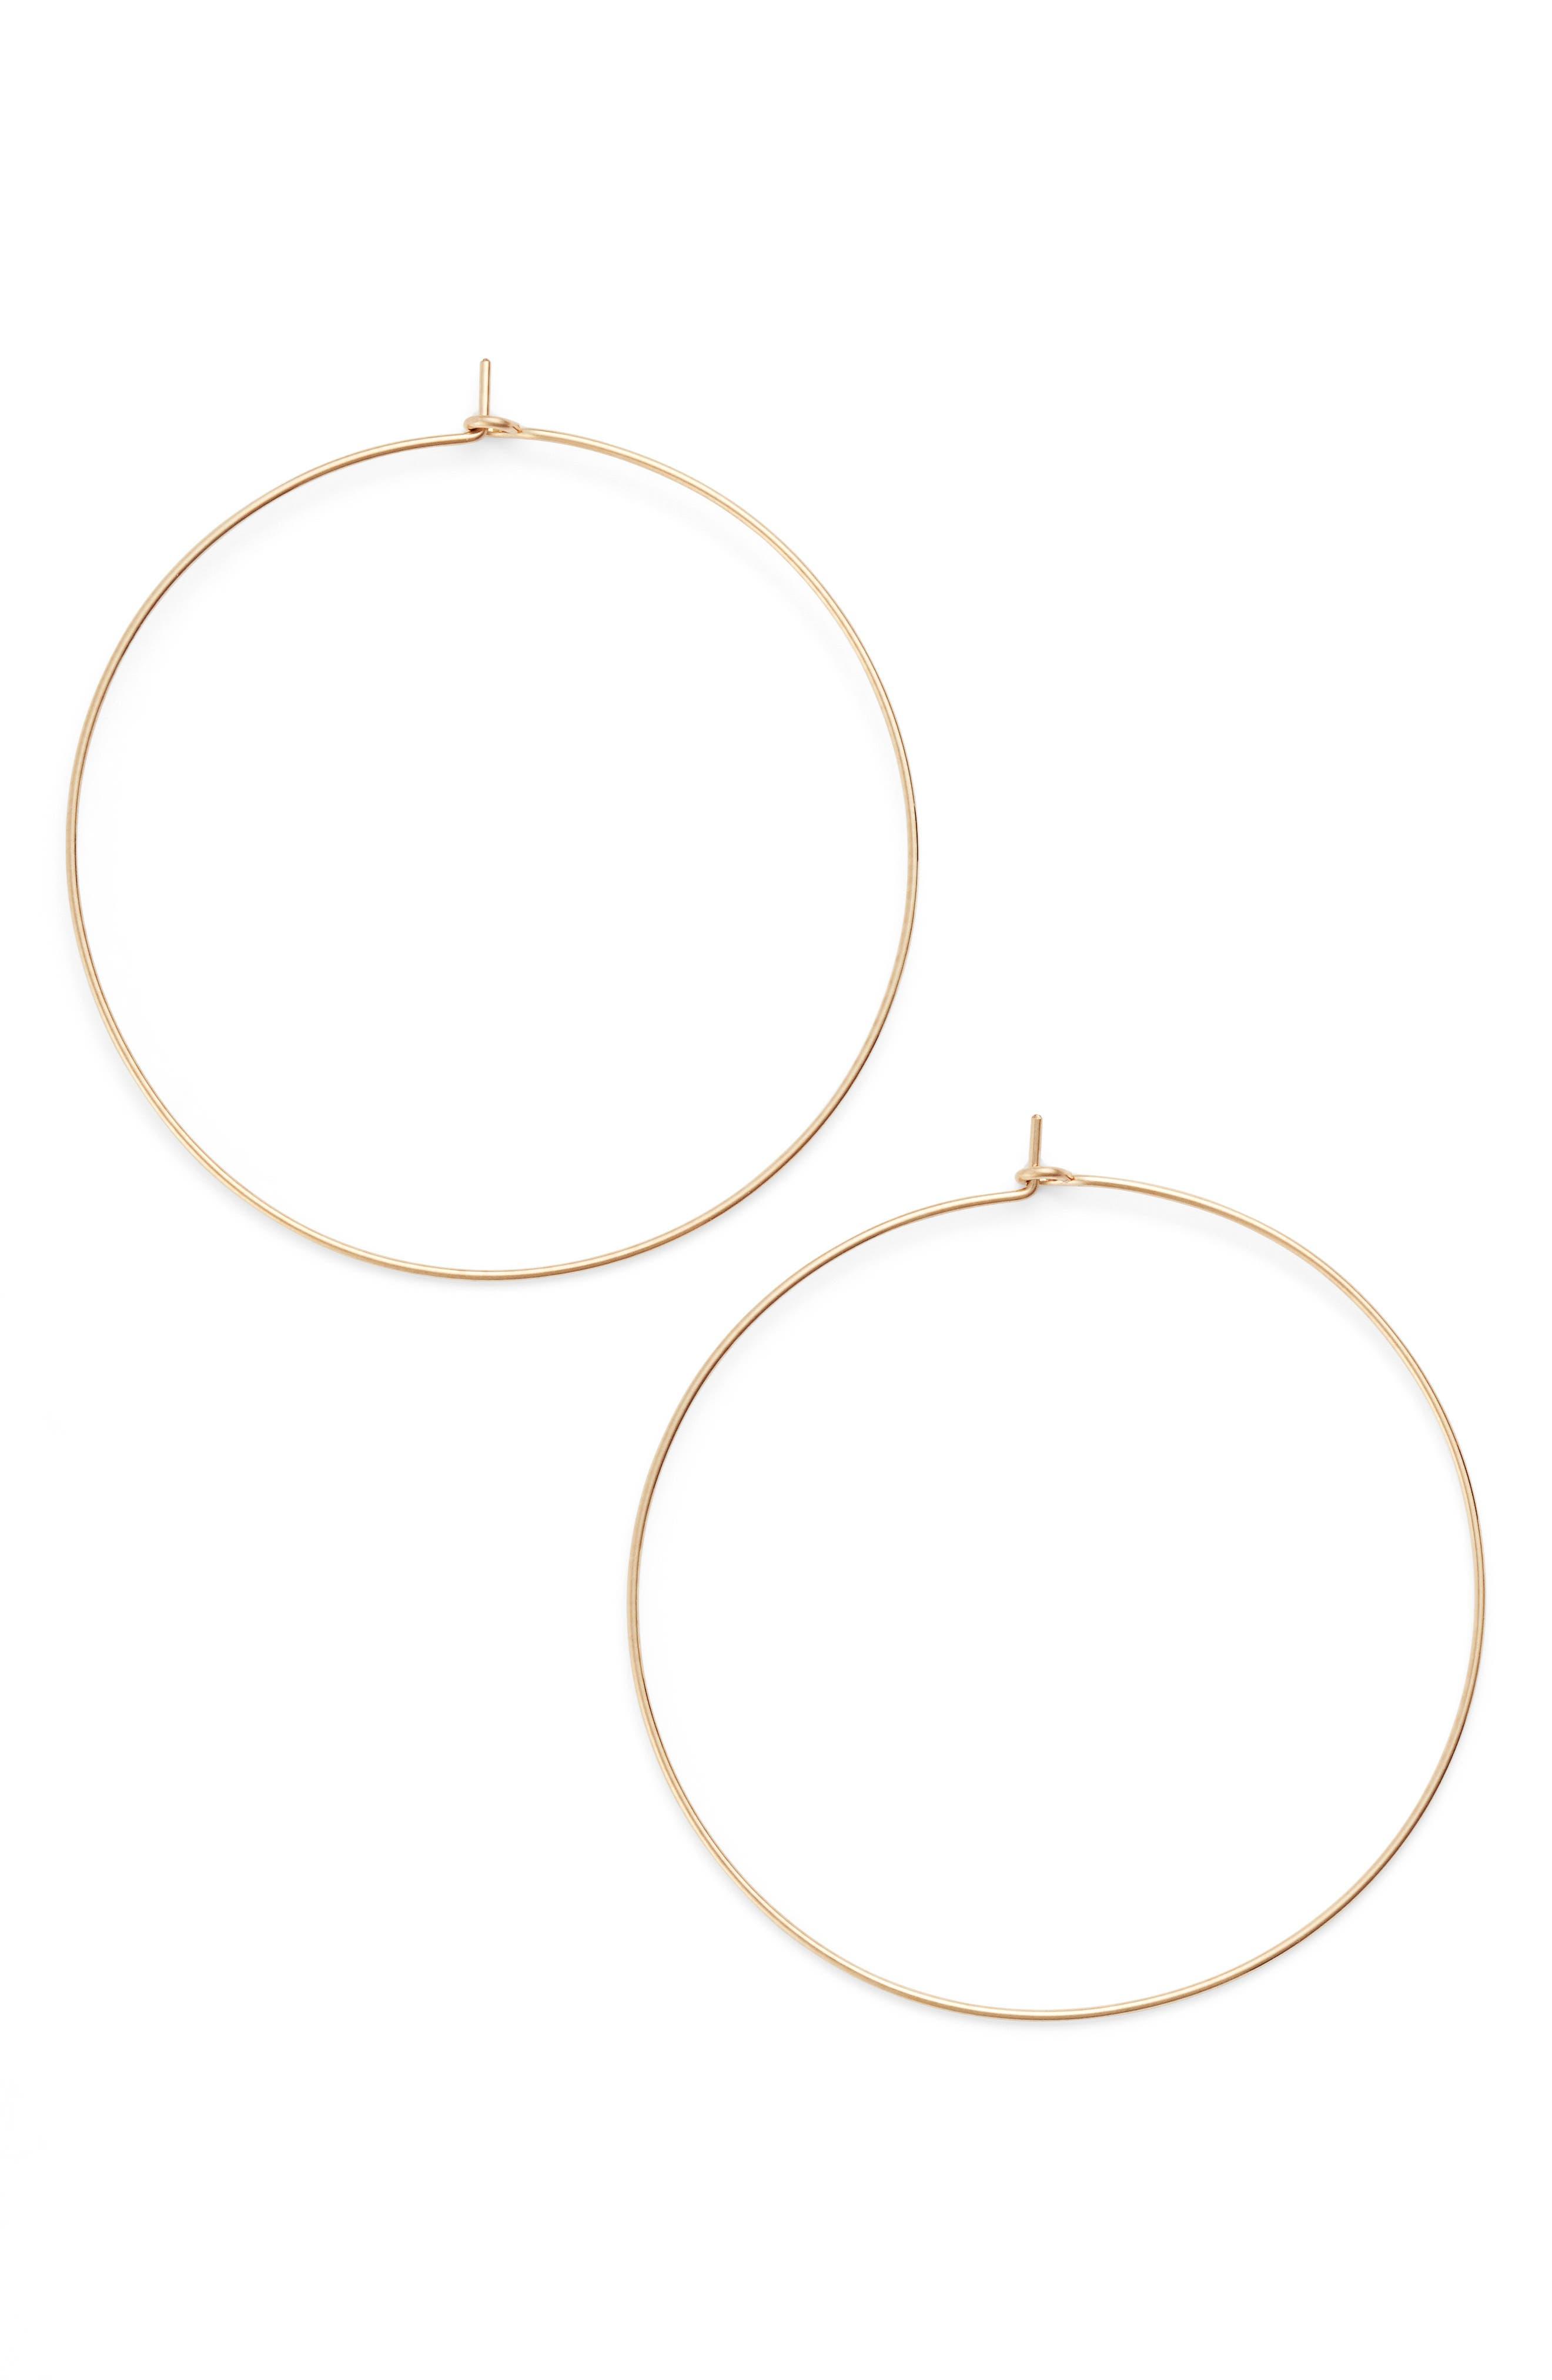 Nashelle Extra Large Hoop Earrings